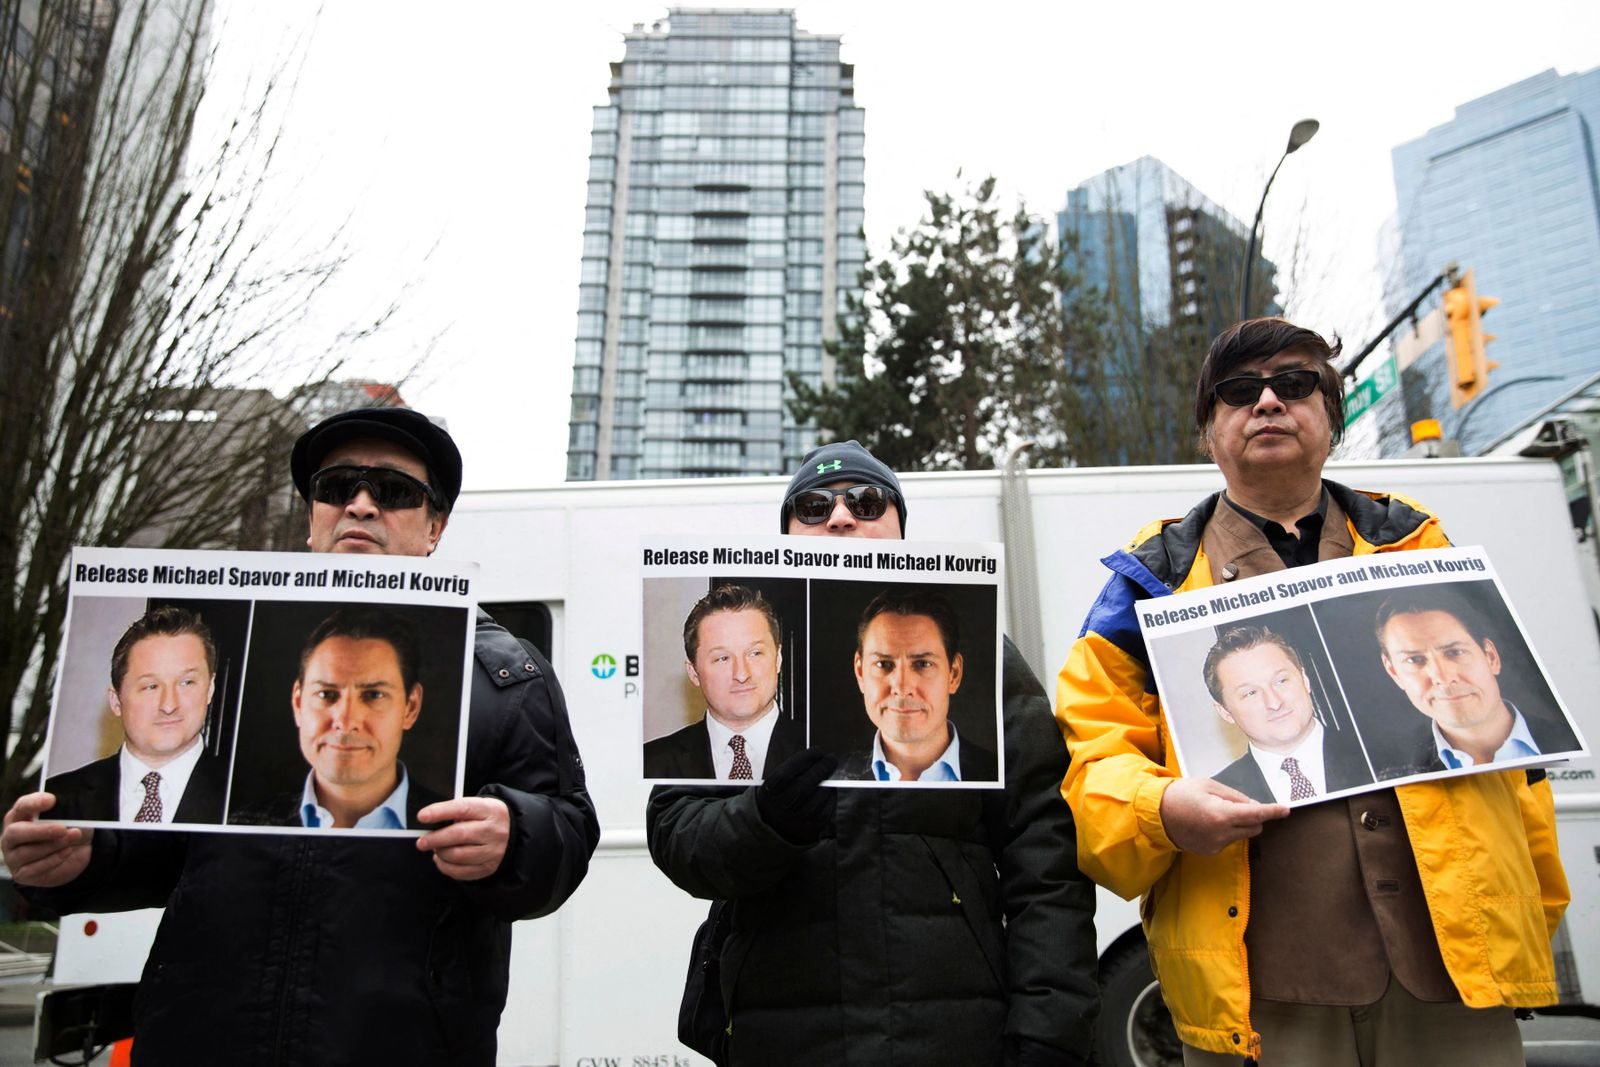 FILES-CANADA-CHINA-US-POLITICS-DIPLOMACY-TRIAL